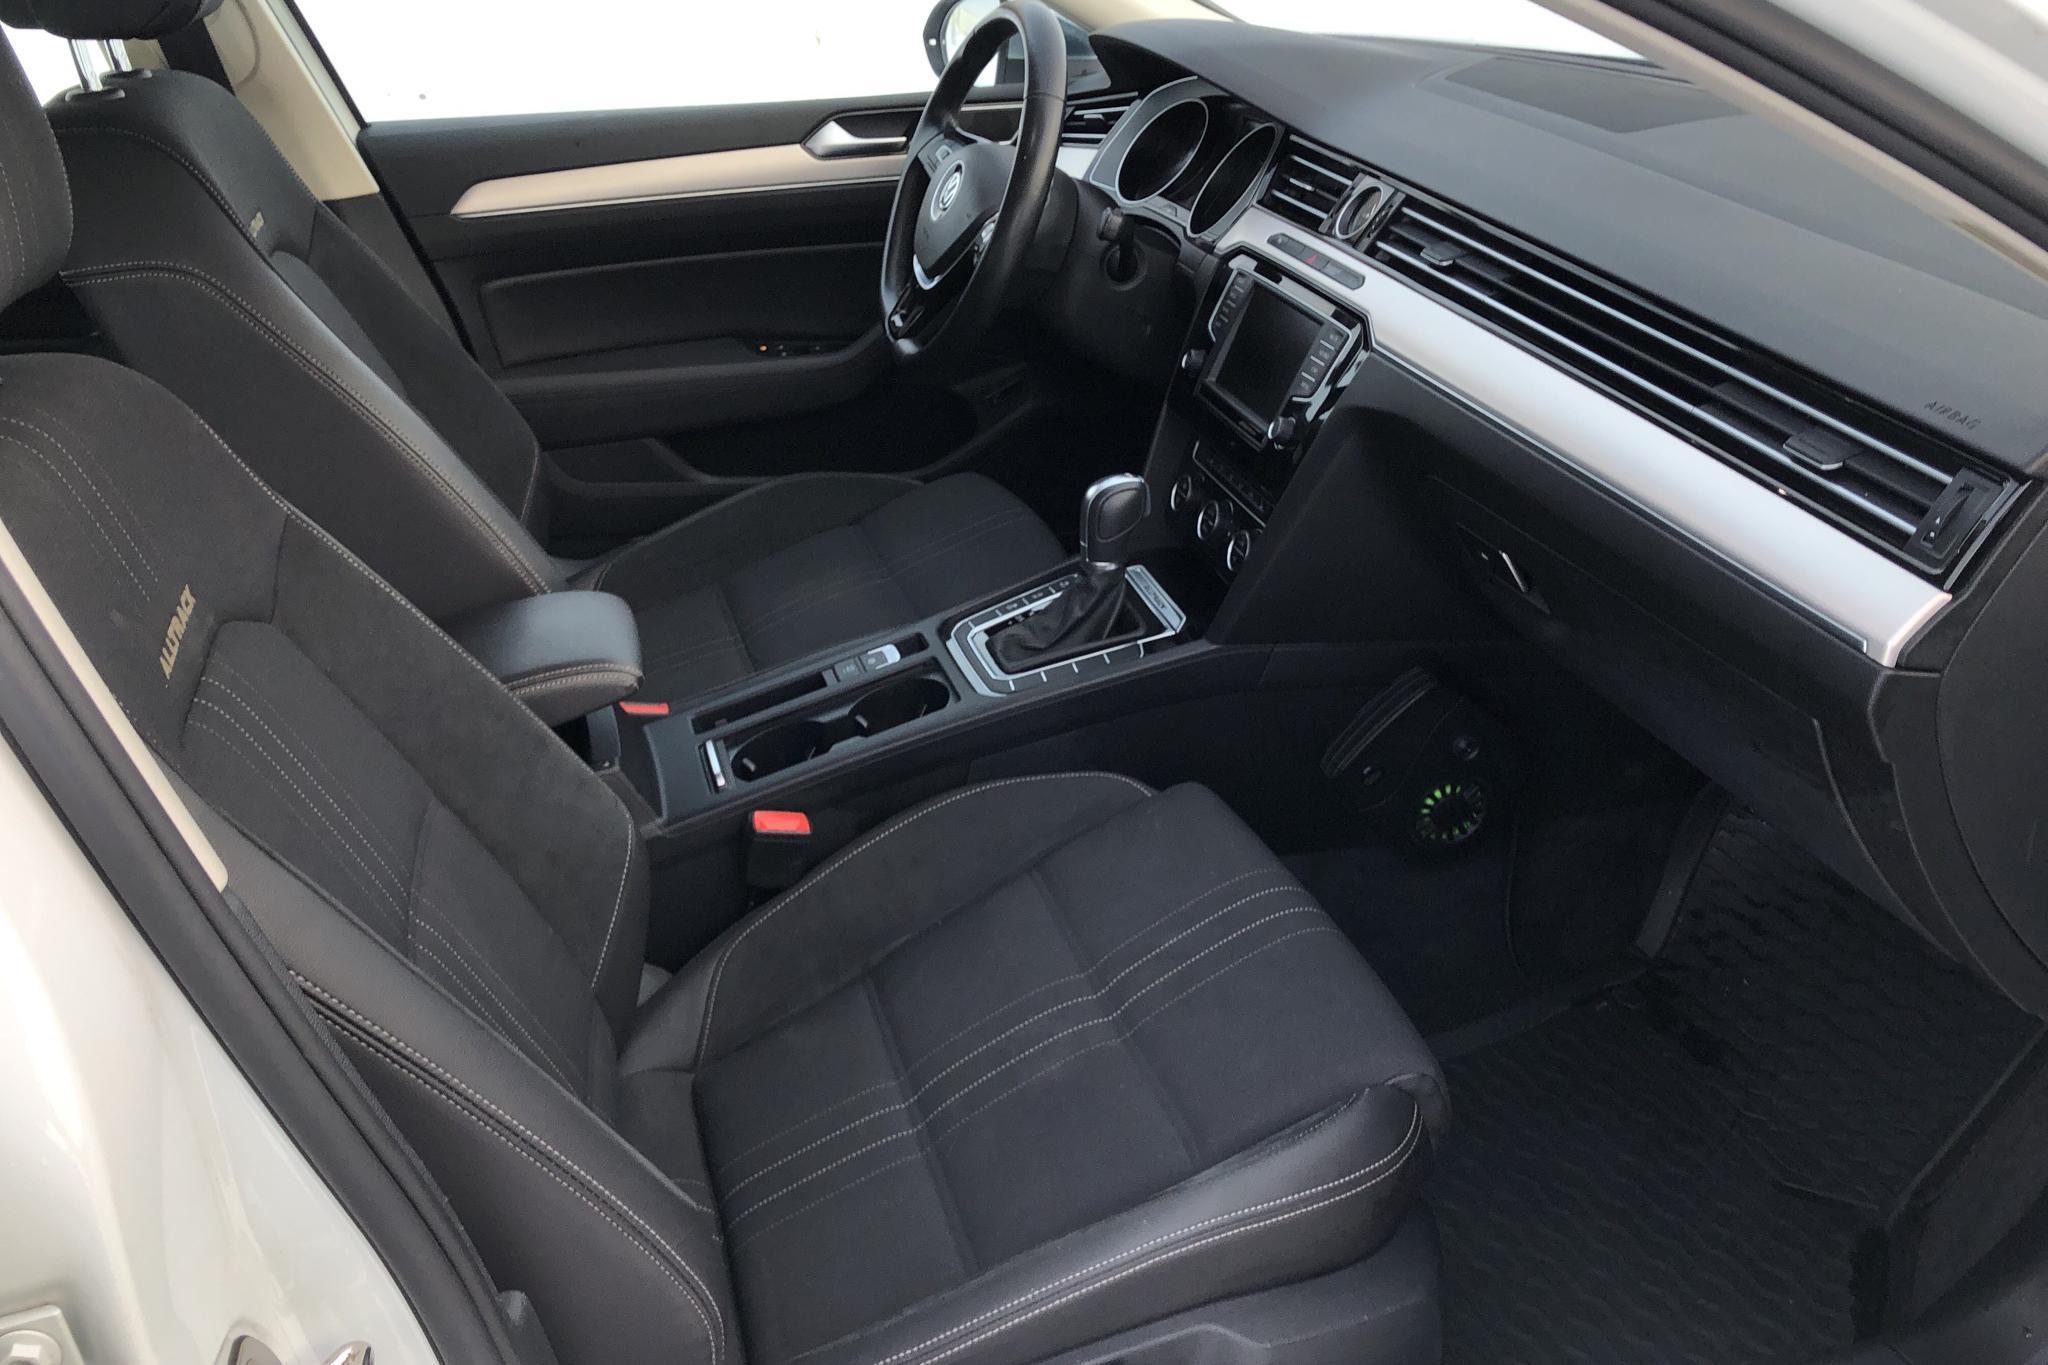 VW Passat Alltrack 2.0 TDI Sportscombi 4MOTION (190hk) - 159 400 km - Automatic - white - 2016